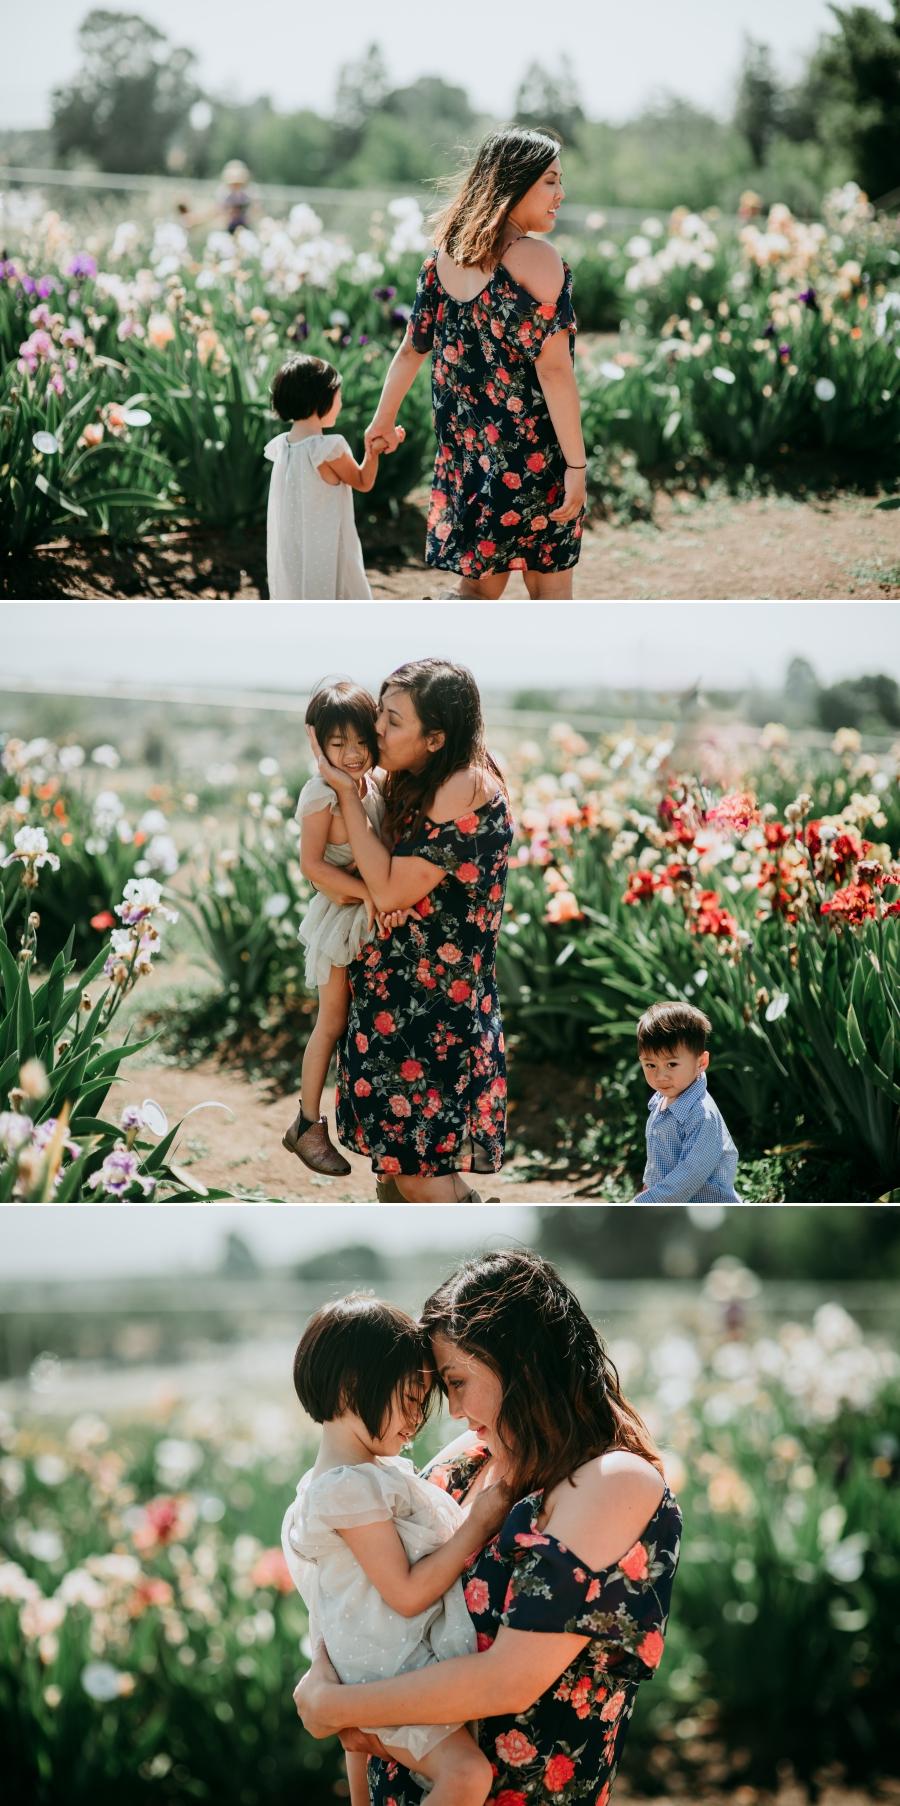 Mothersday2019 3.jpg